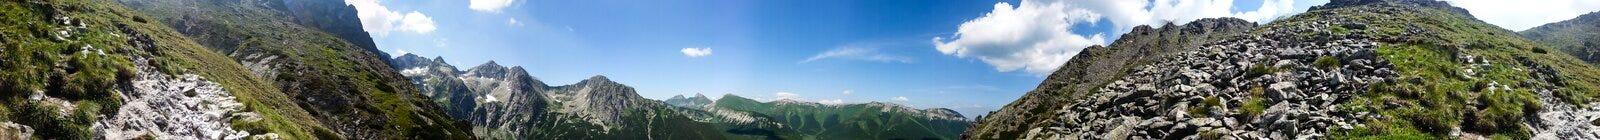 Rocky mountain landscape with blue sky in Vysoke Tatry.  royalty free stock photos